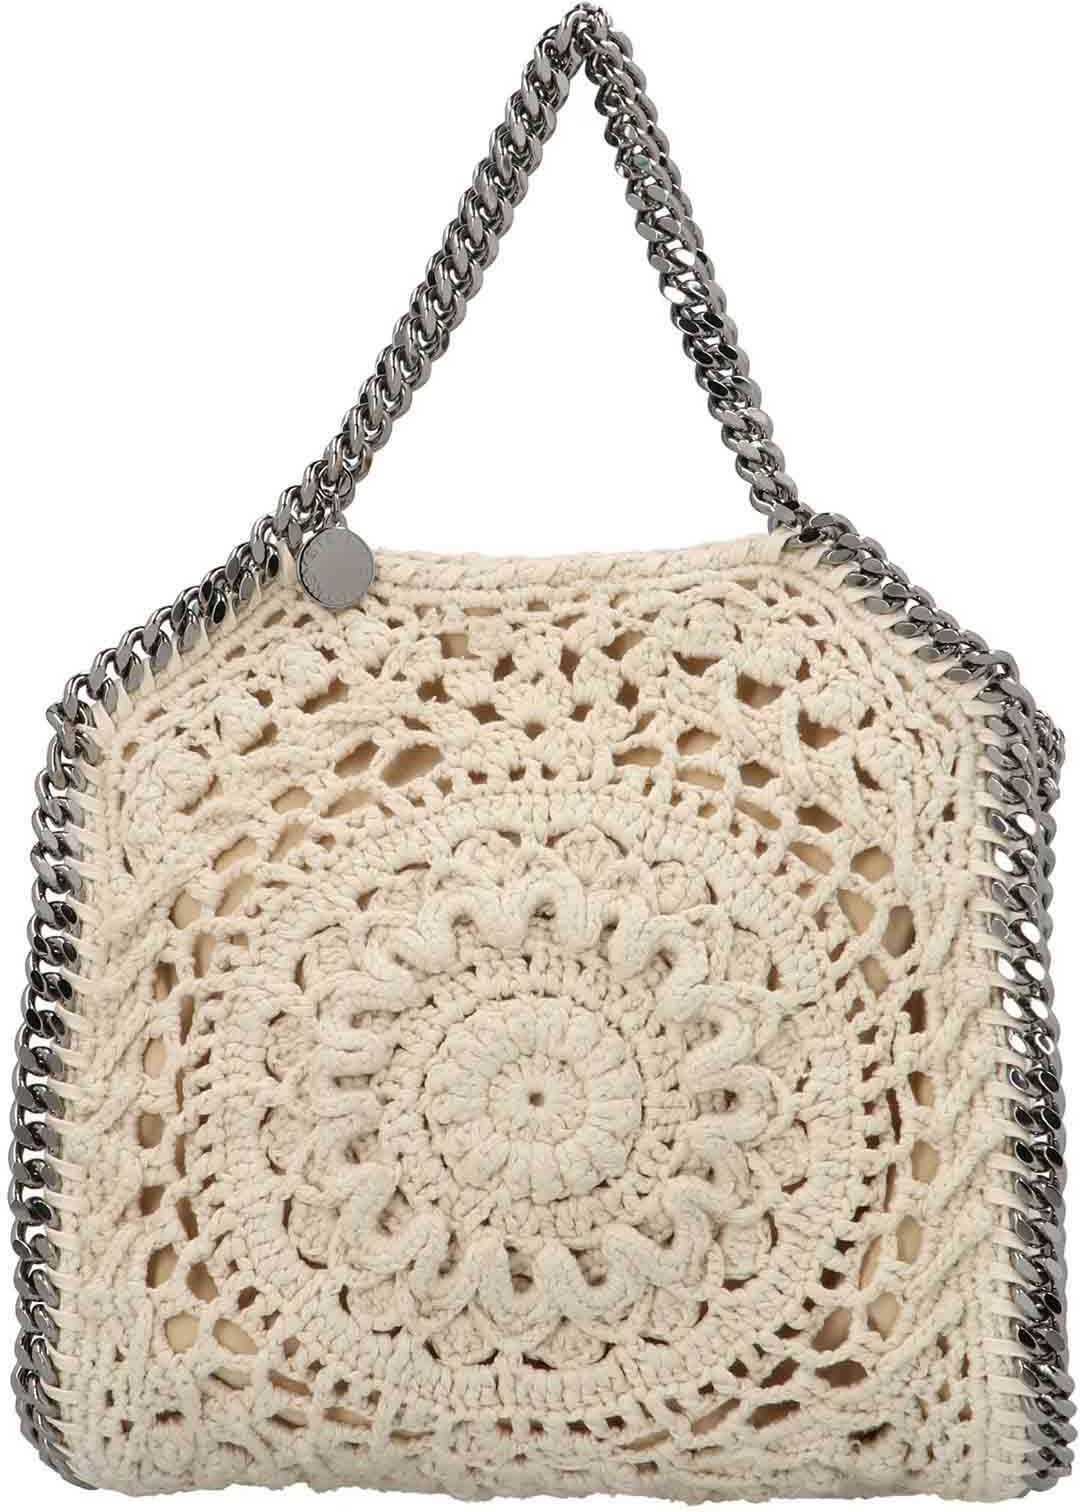 Stella McCartney Falabella Crochet Bag In Ivory Color 371223W87879002 White imagine b-mall.ro